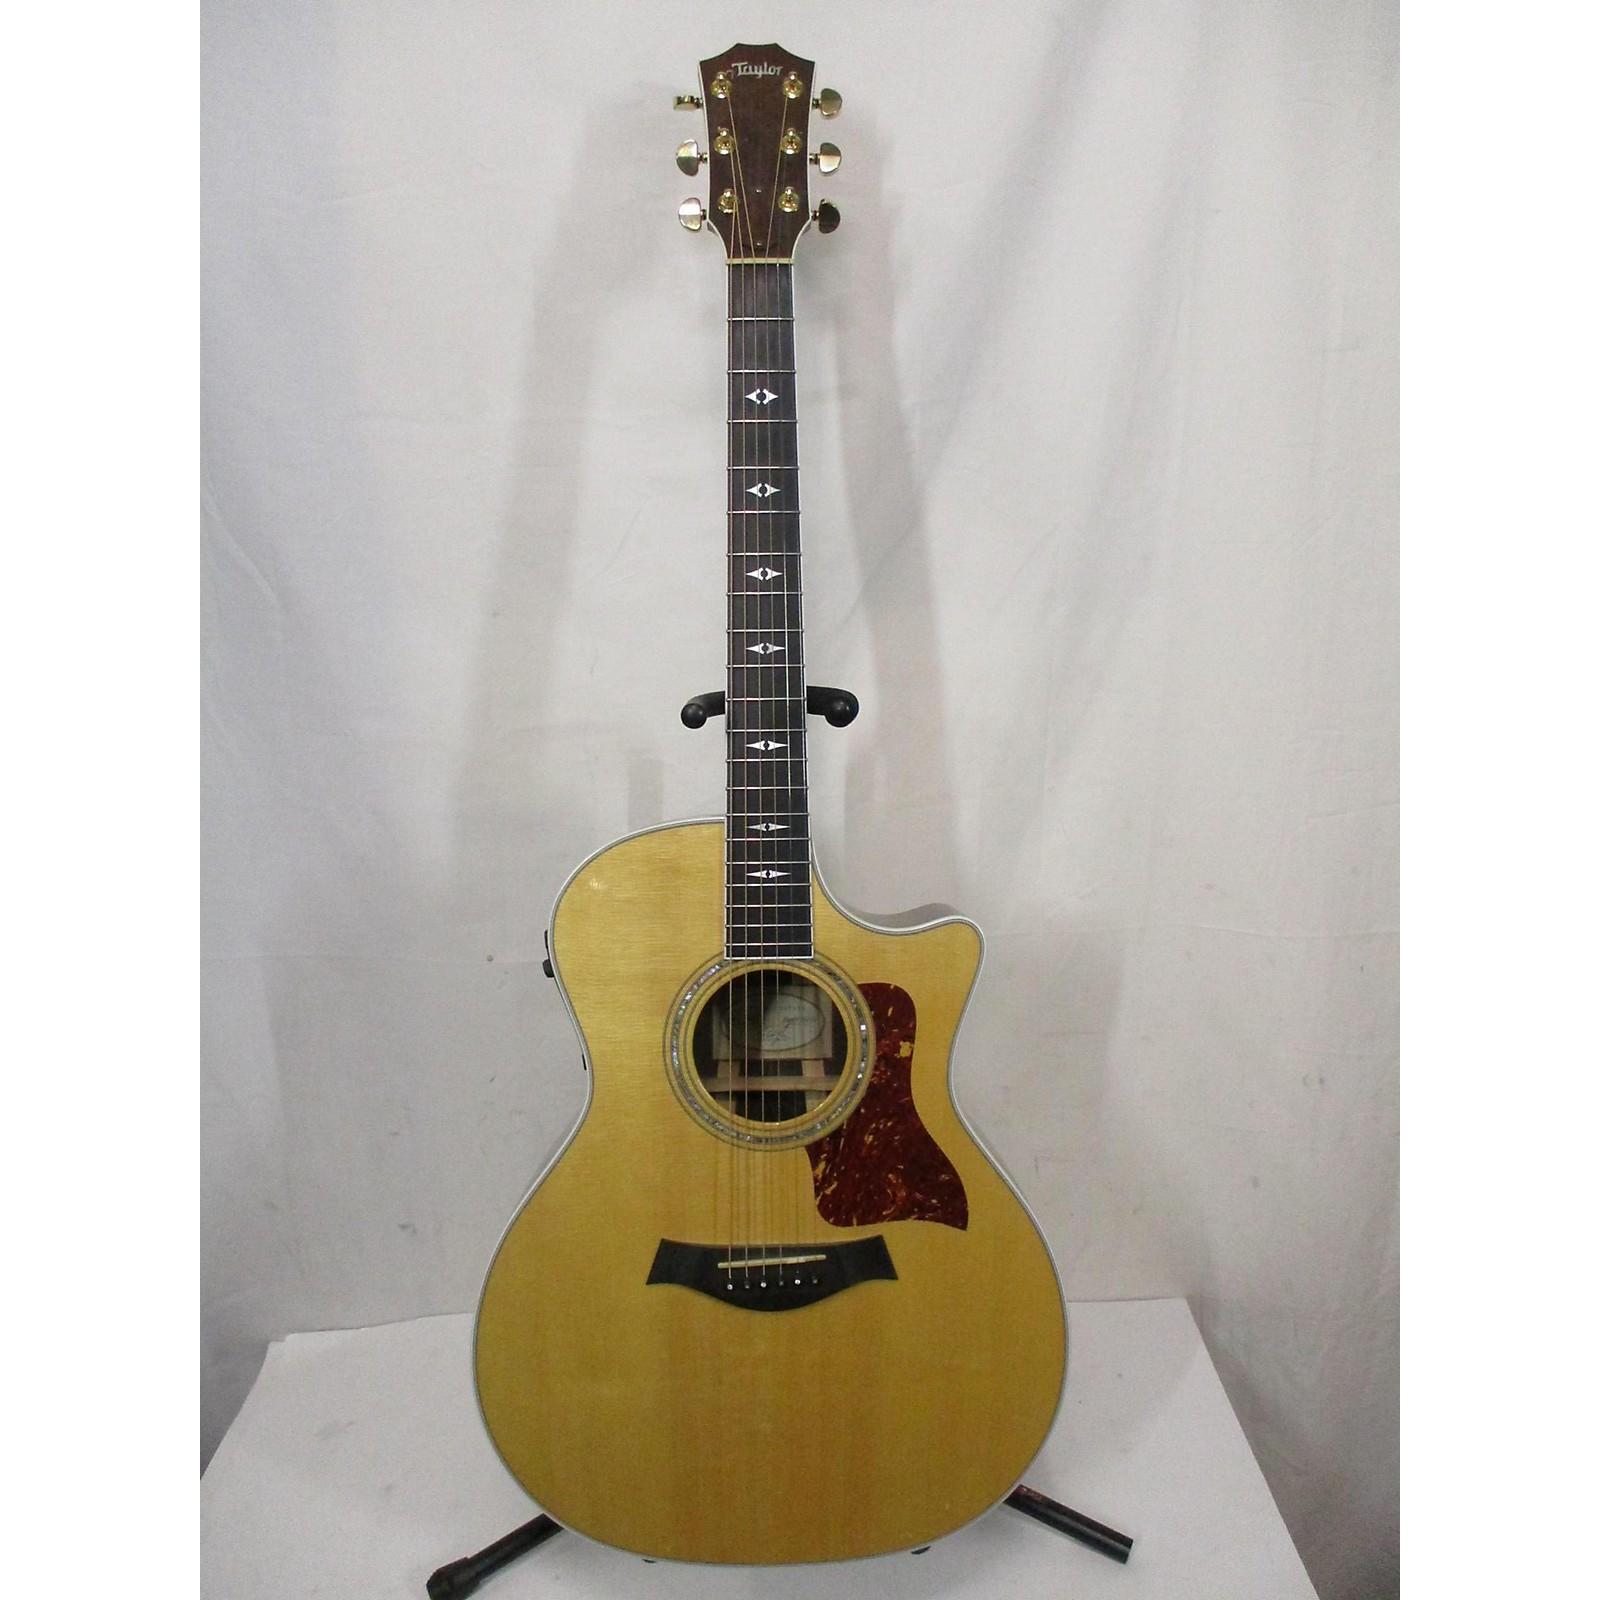 Taylor 814-bCE Acoustic Electric Guitar